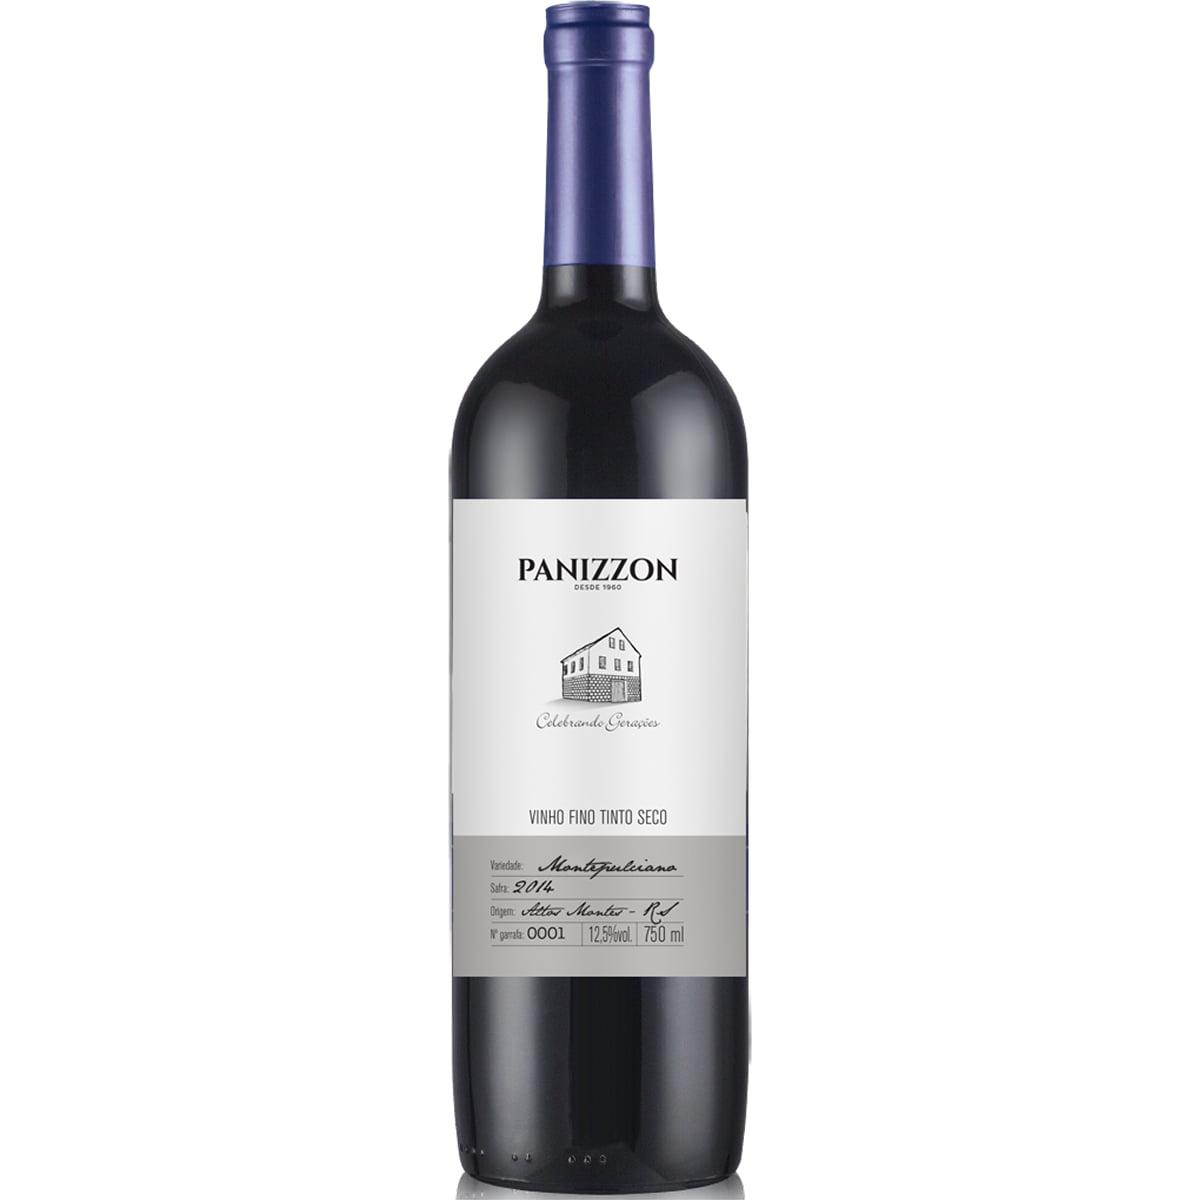 Vinho Panizzon Montepulciano Tinto Seco 750ml